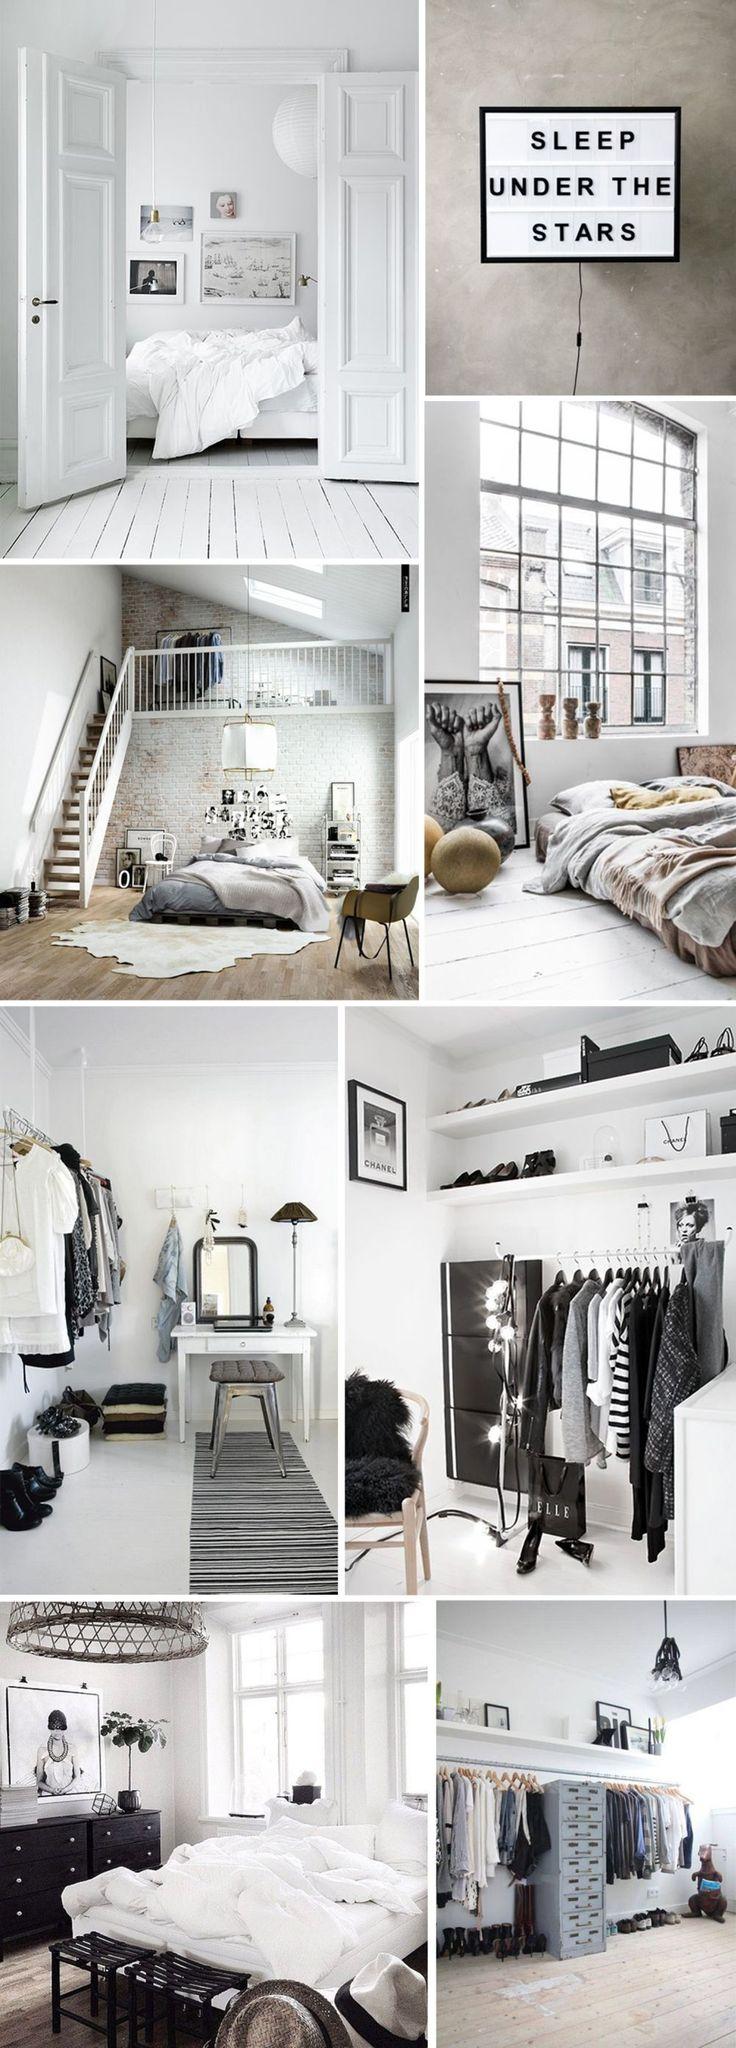 Bedroom Interior Designs (548)   https://www.snowbedding.com/